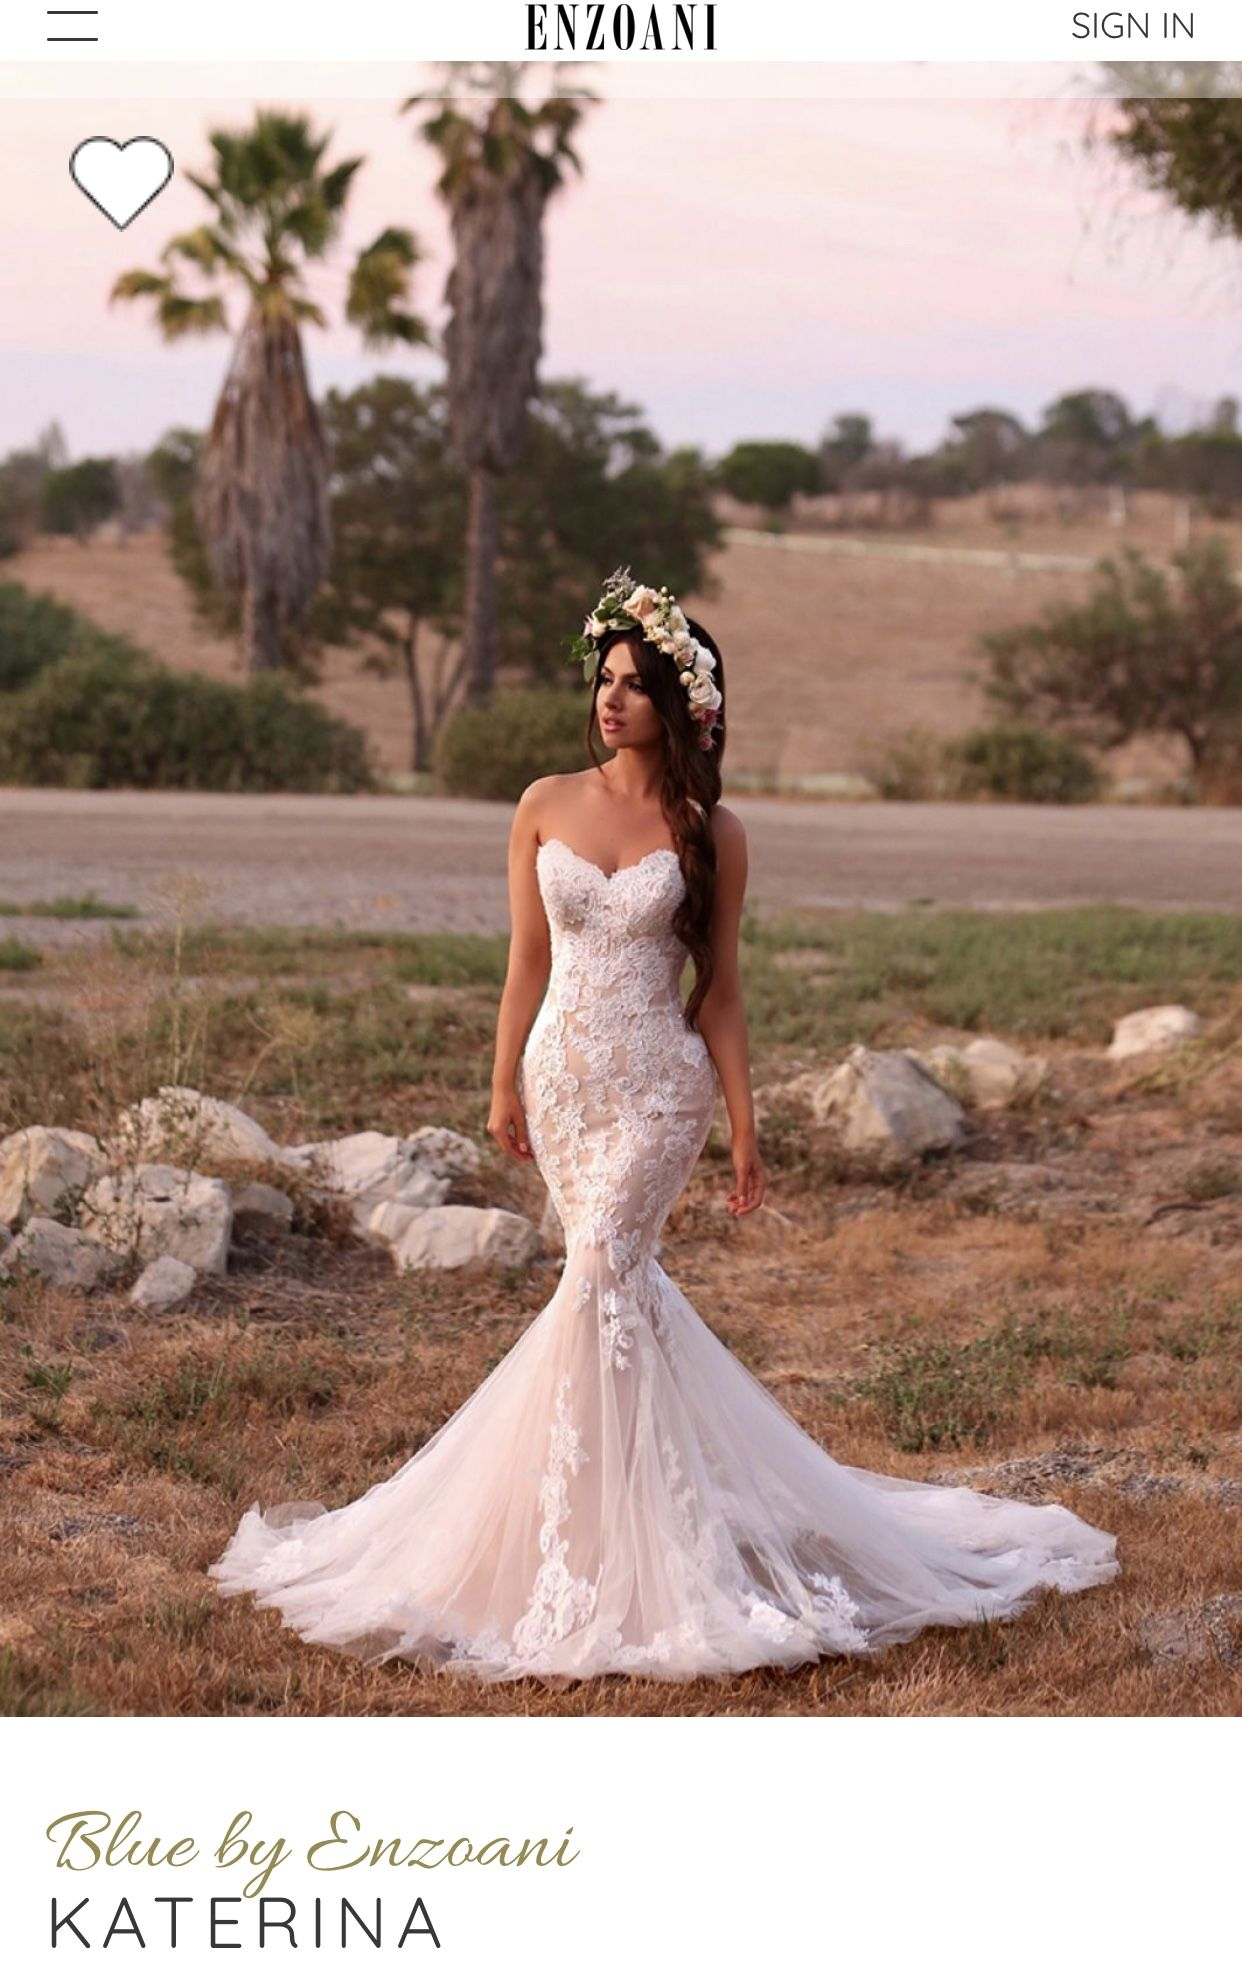 Pin By Haley Hull On Wedding 2021 In 2020 Wedding Dresses Lace Wedding Dresses Mermaid Wedding Dress